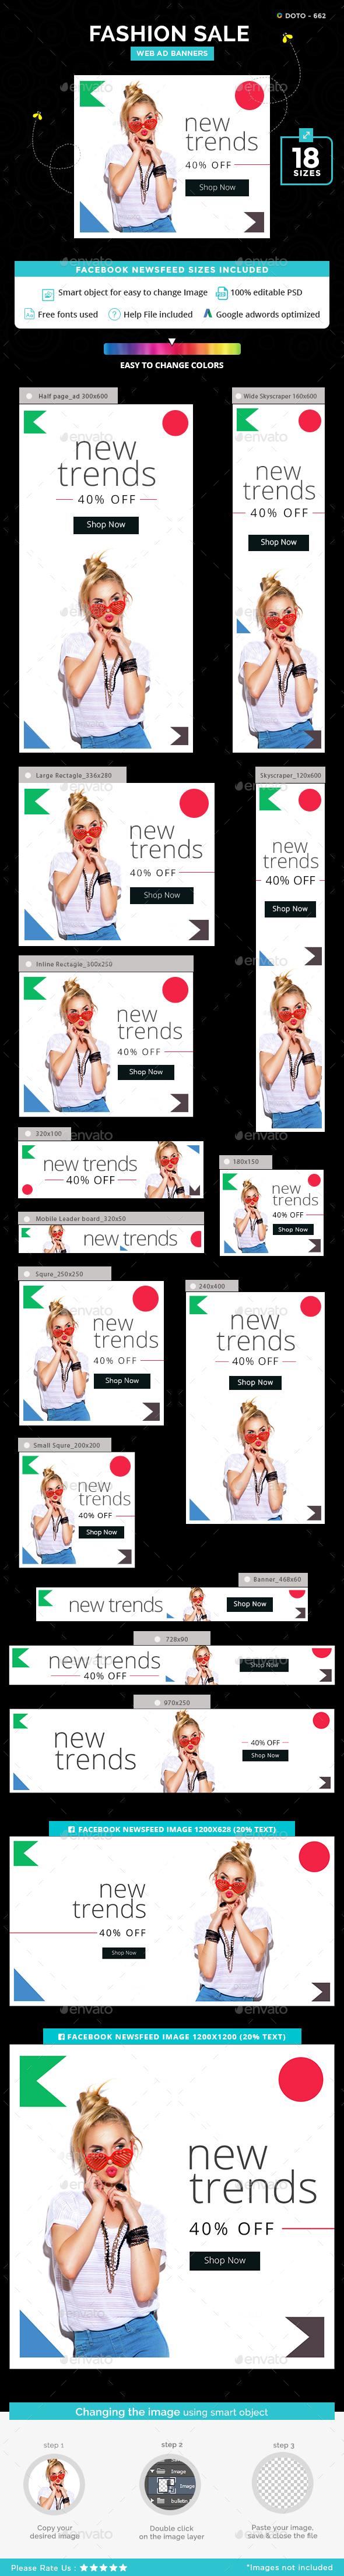 Fashion Sale Banner Set - Banners & Ads Web Elements